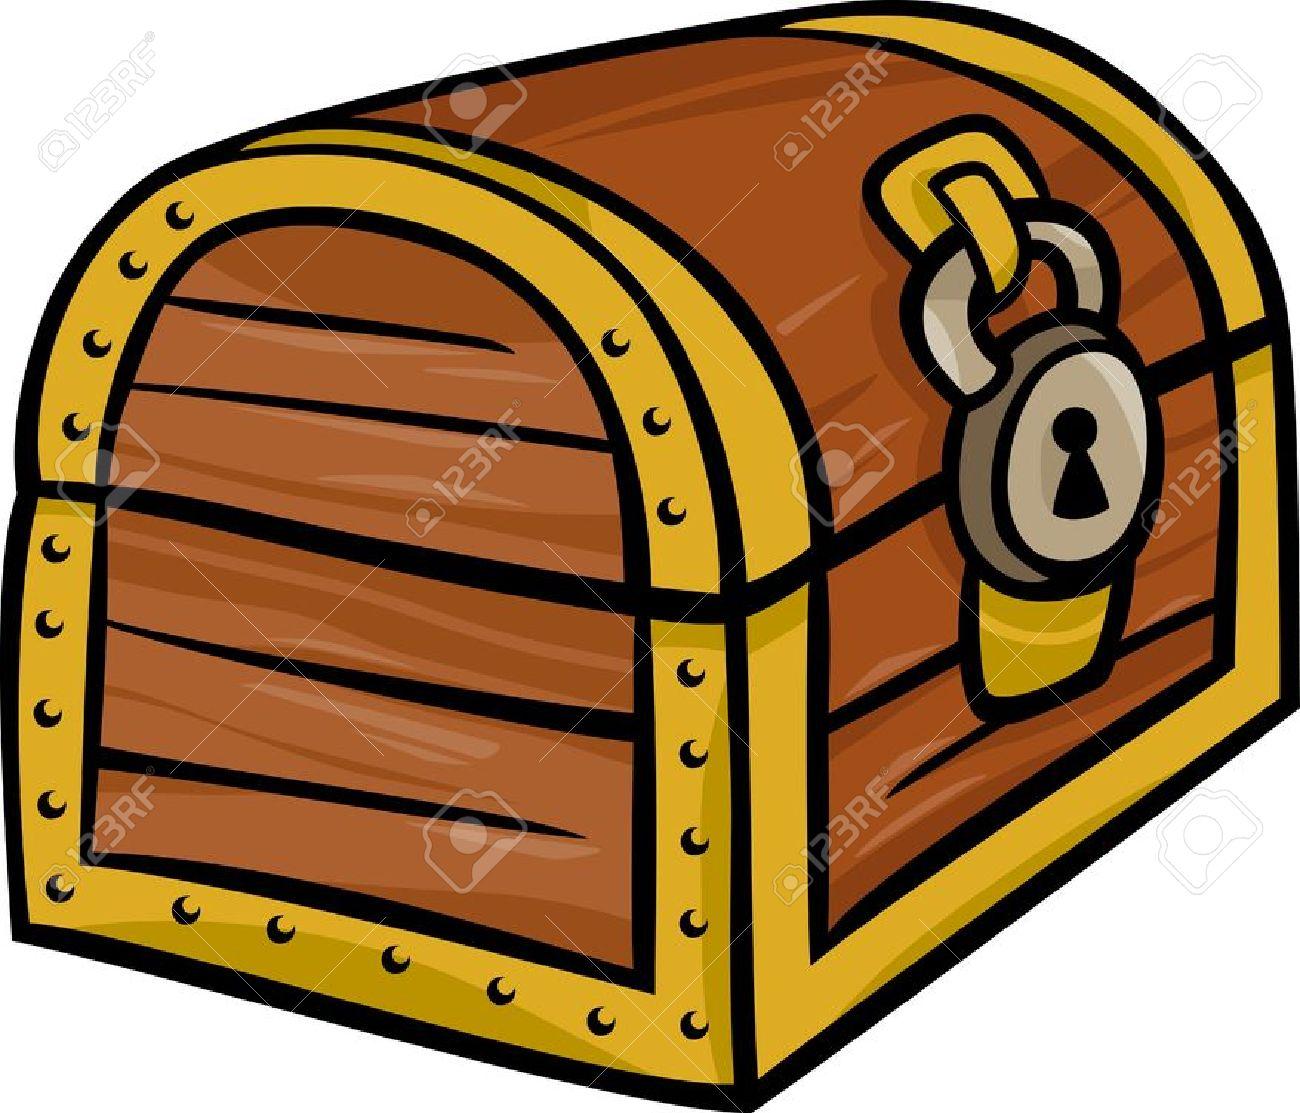 Lock box clipart.